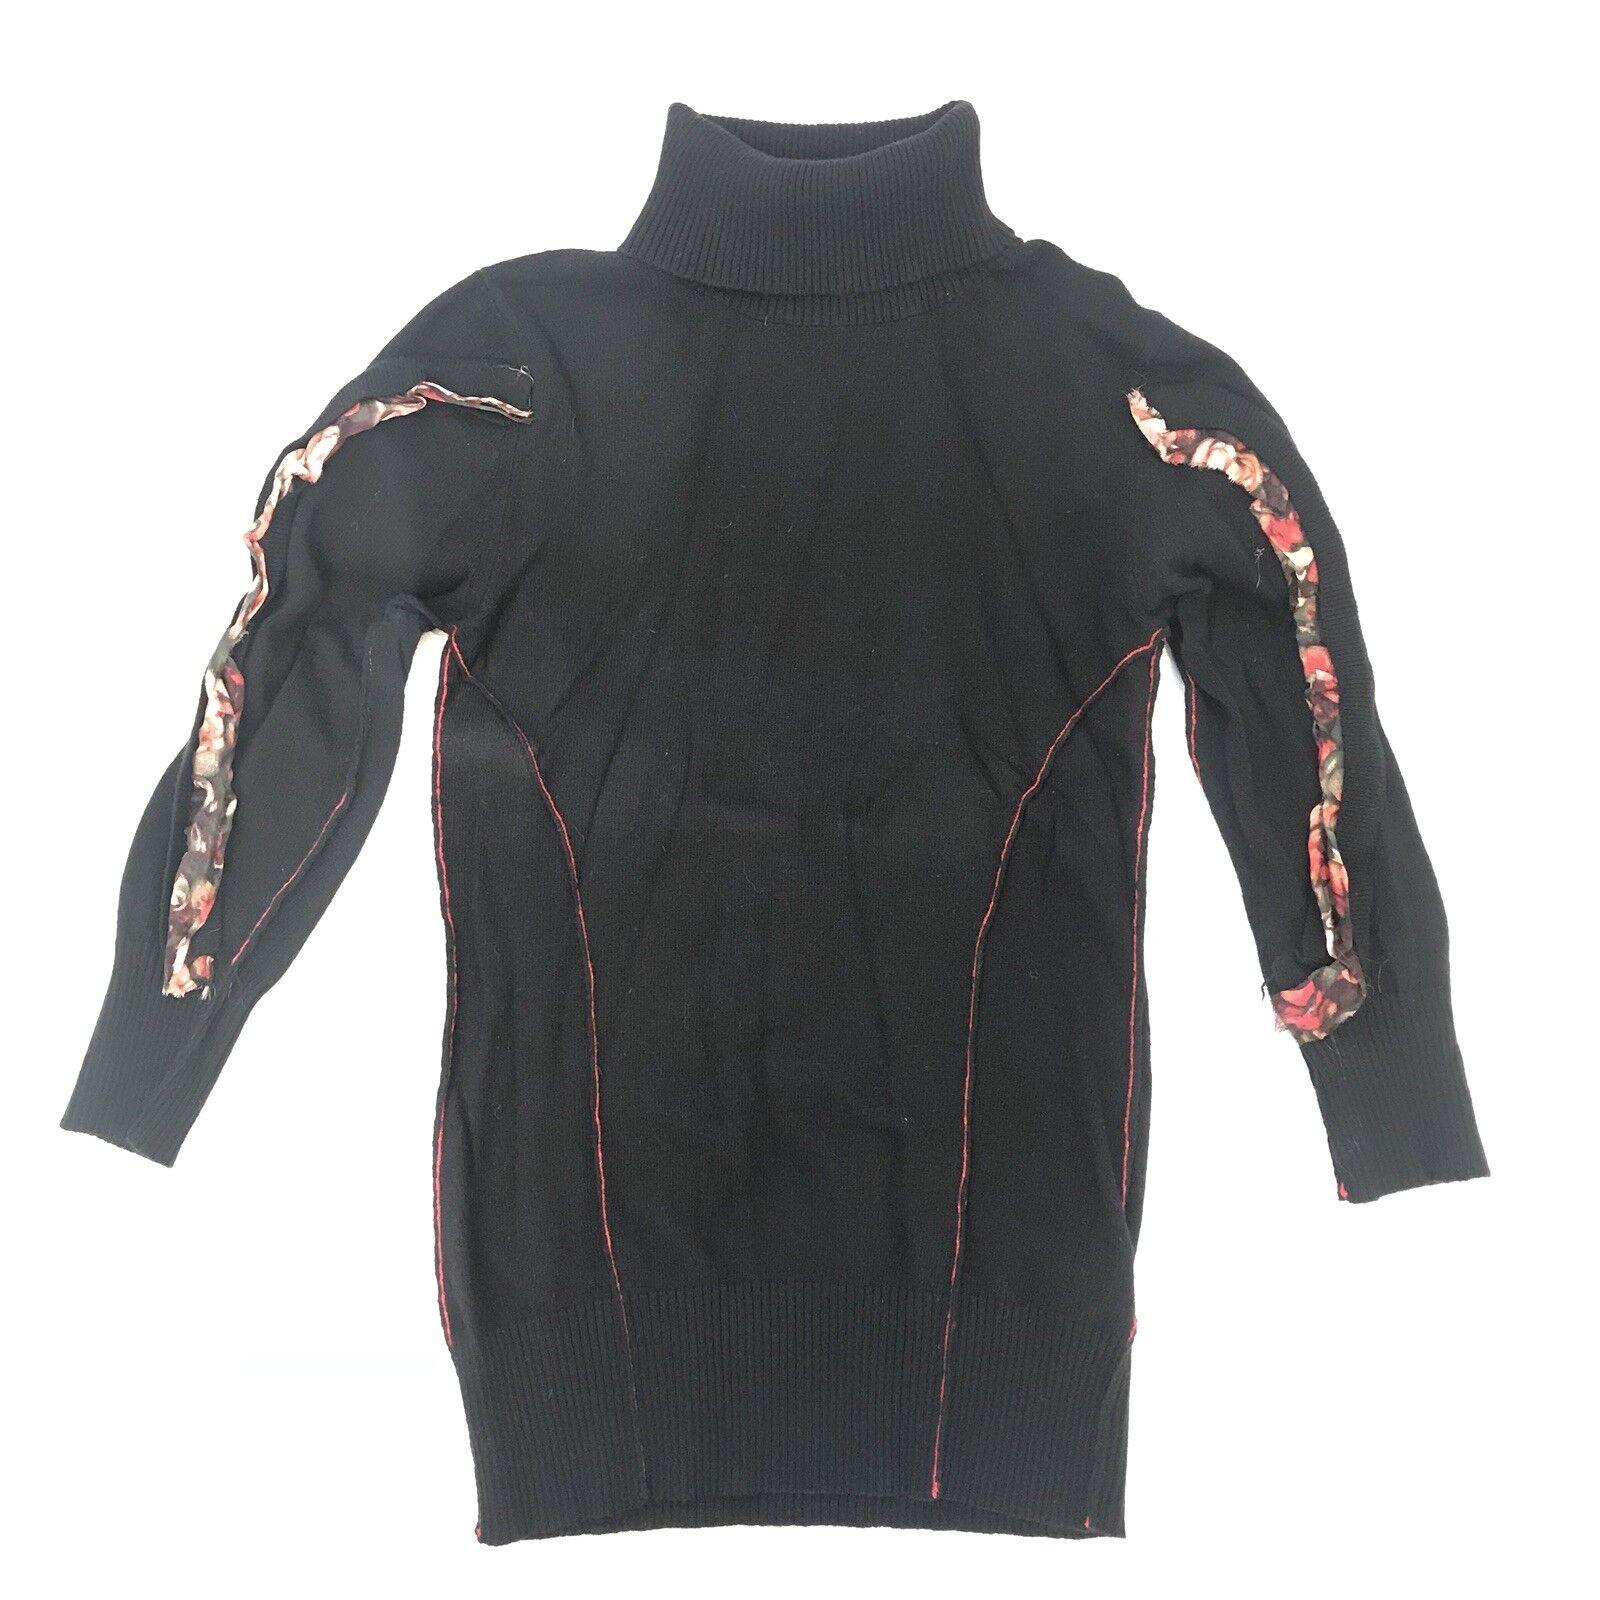 JUST CAVALLI Cashmere Sweater Sz 38